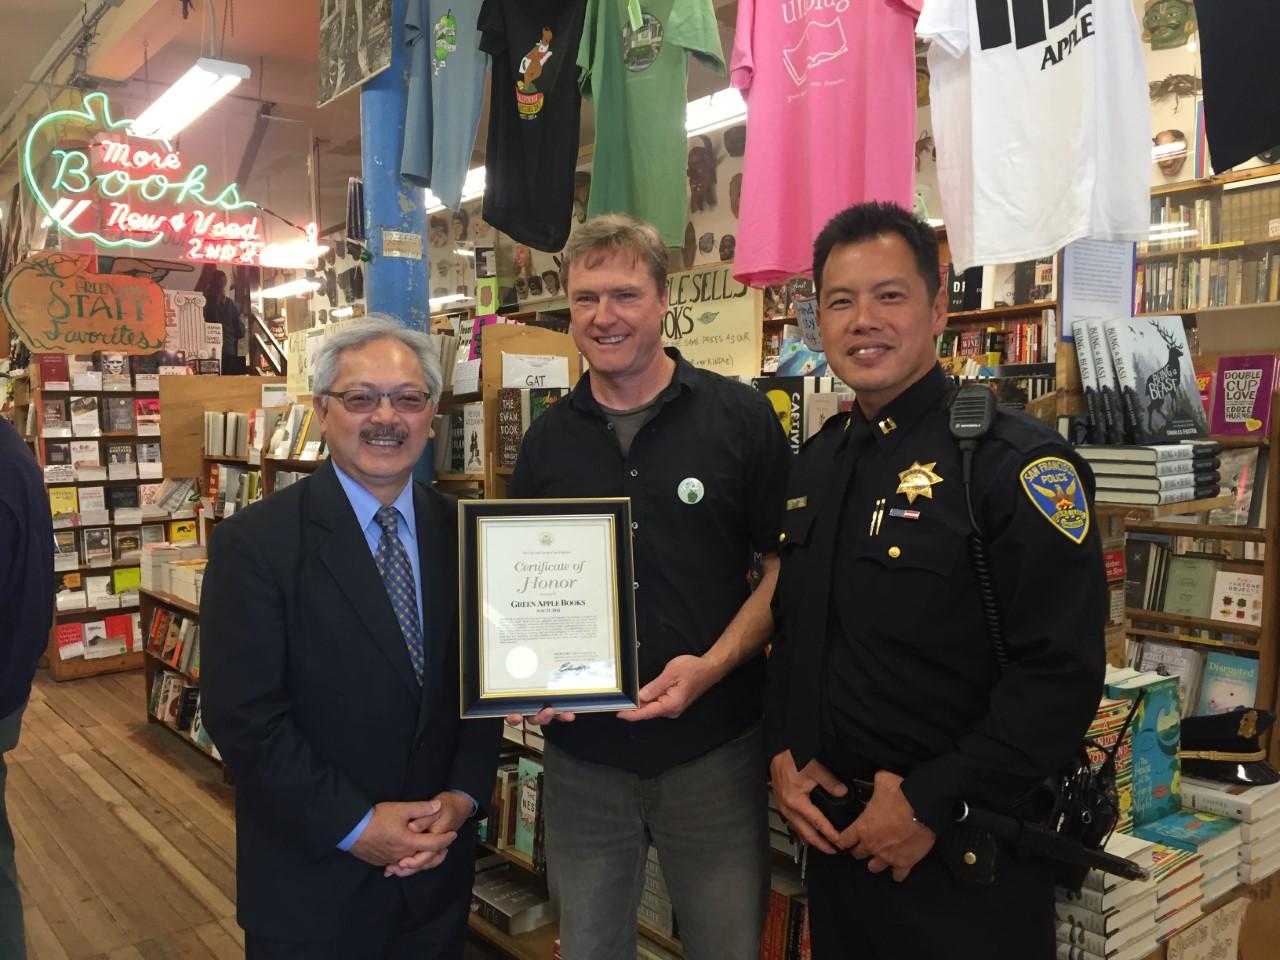 L to R: Mayor Ed Lee, a Green Apple Books staff member, and SFPD Captain Paul Yep